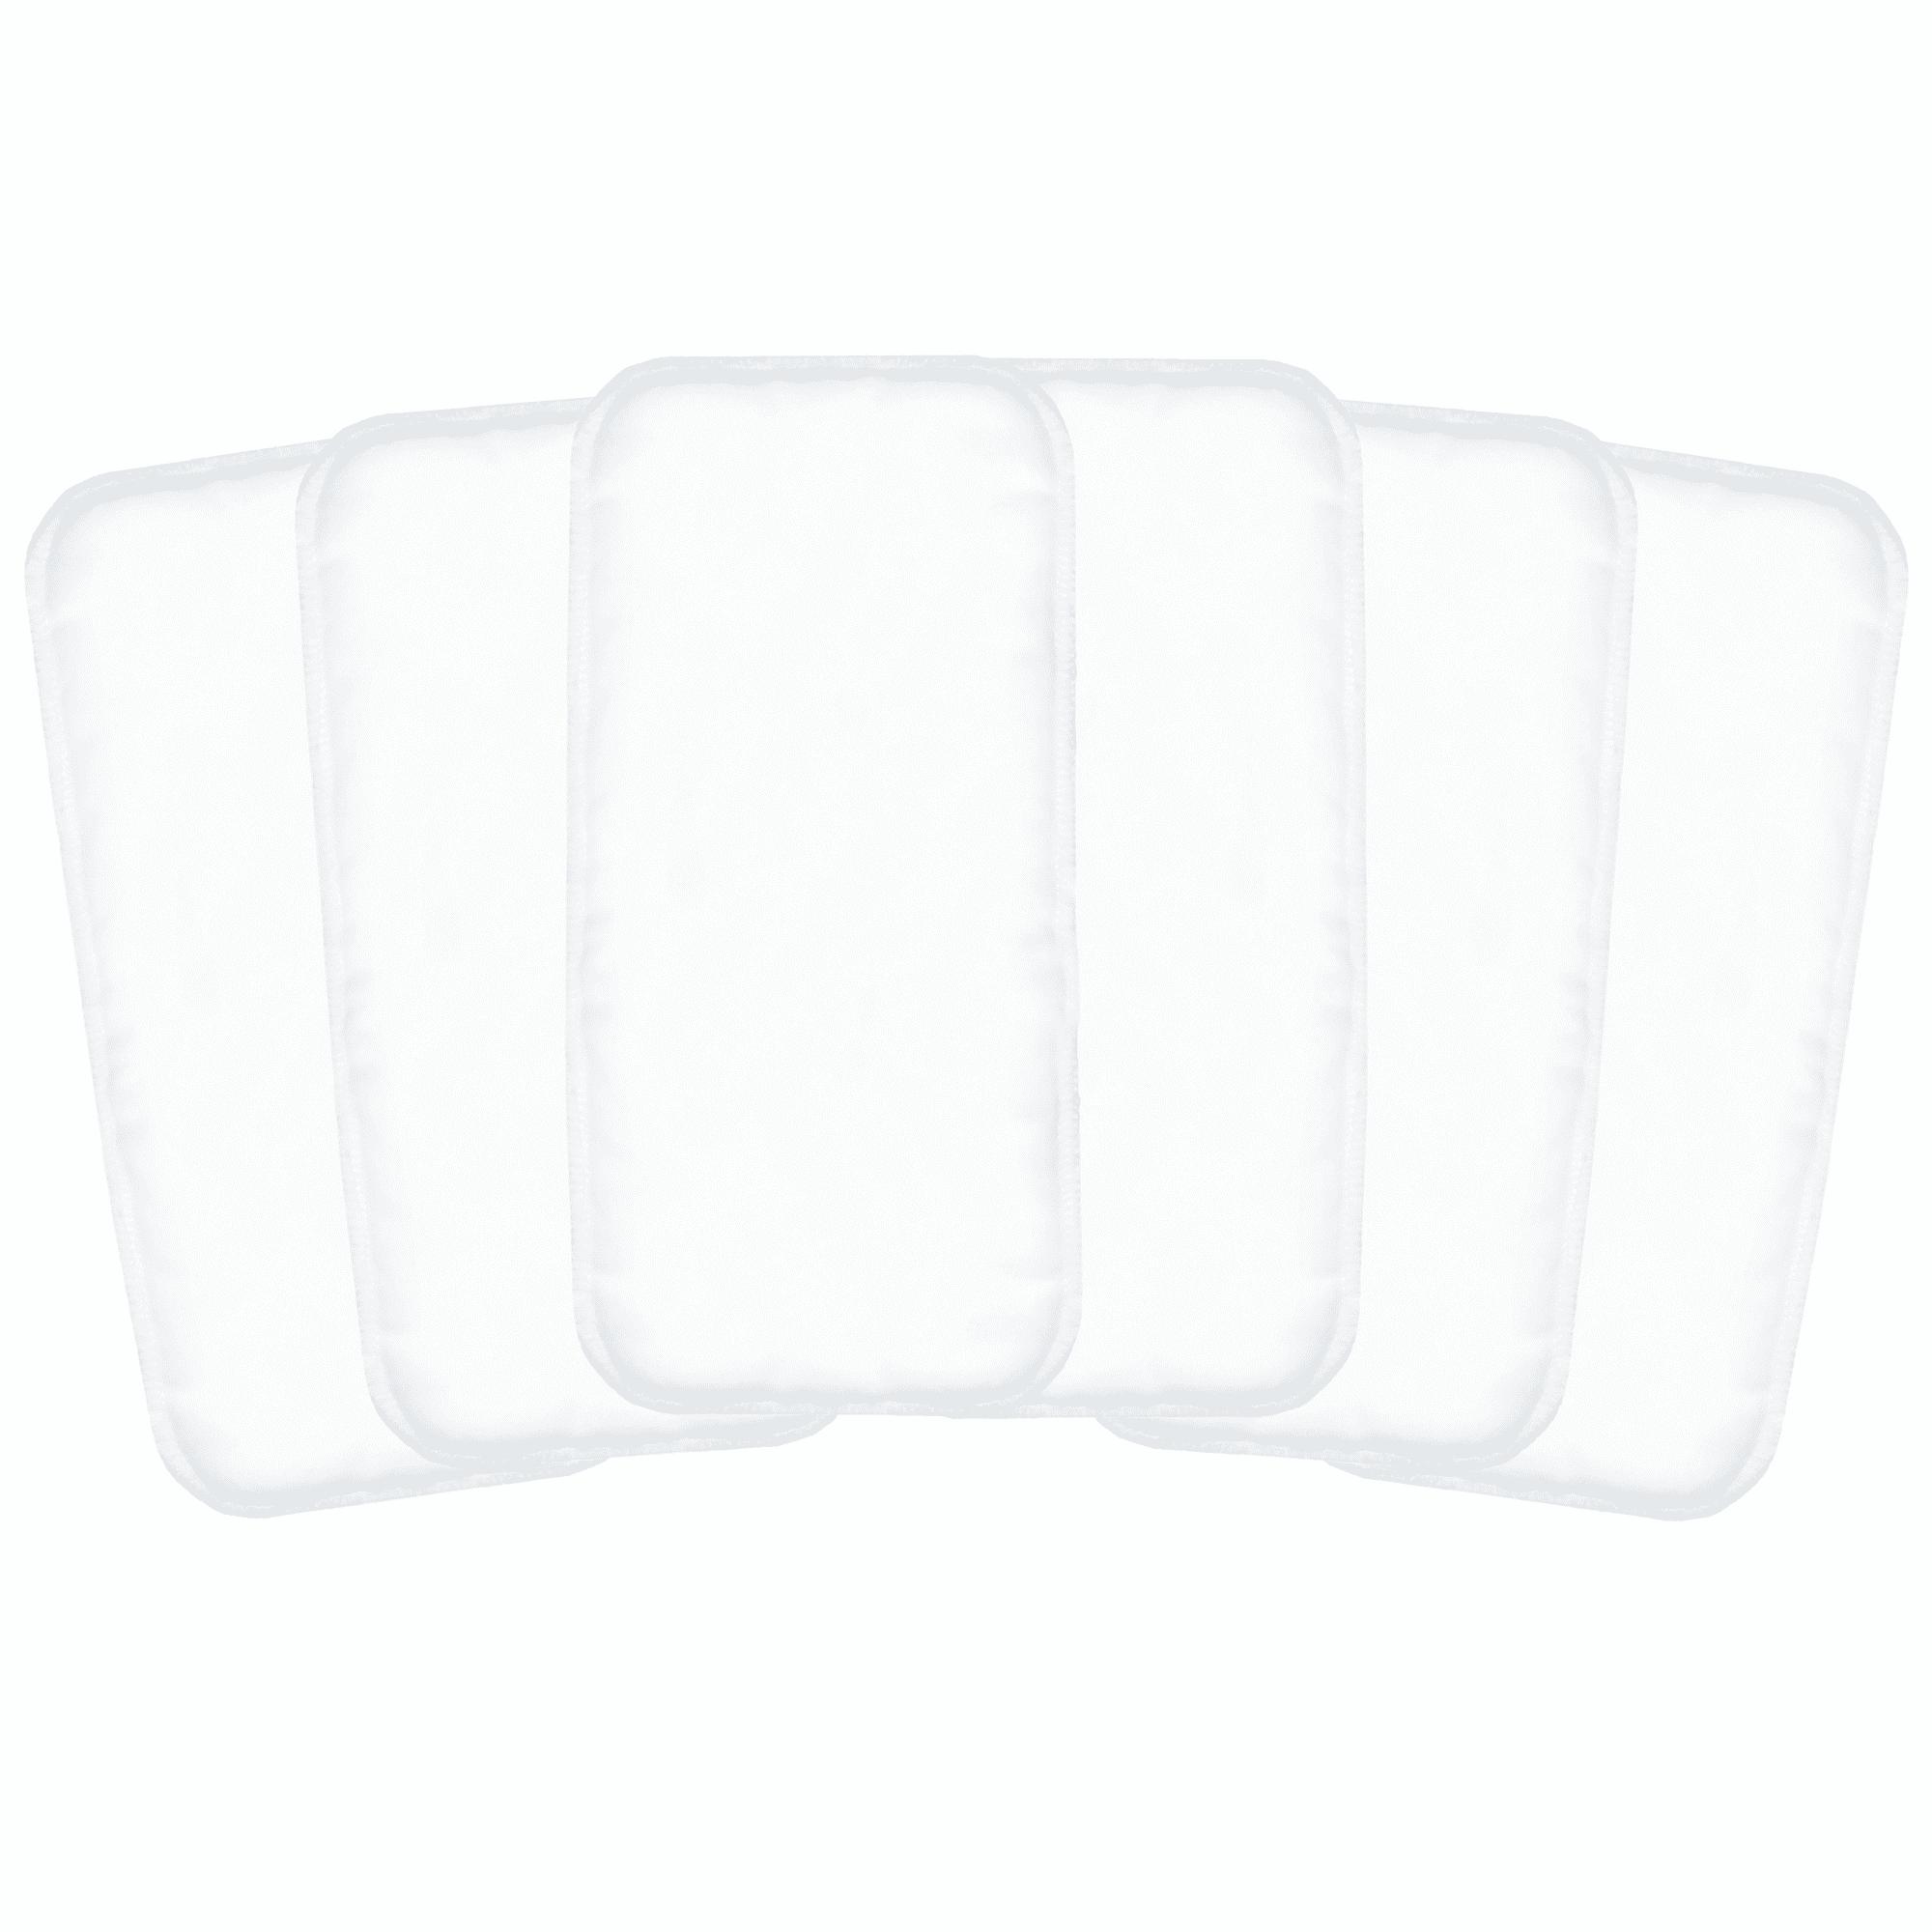 Flip Stay Dry Newborn Size Inserts 6-pack